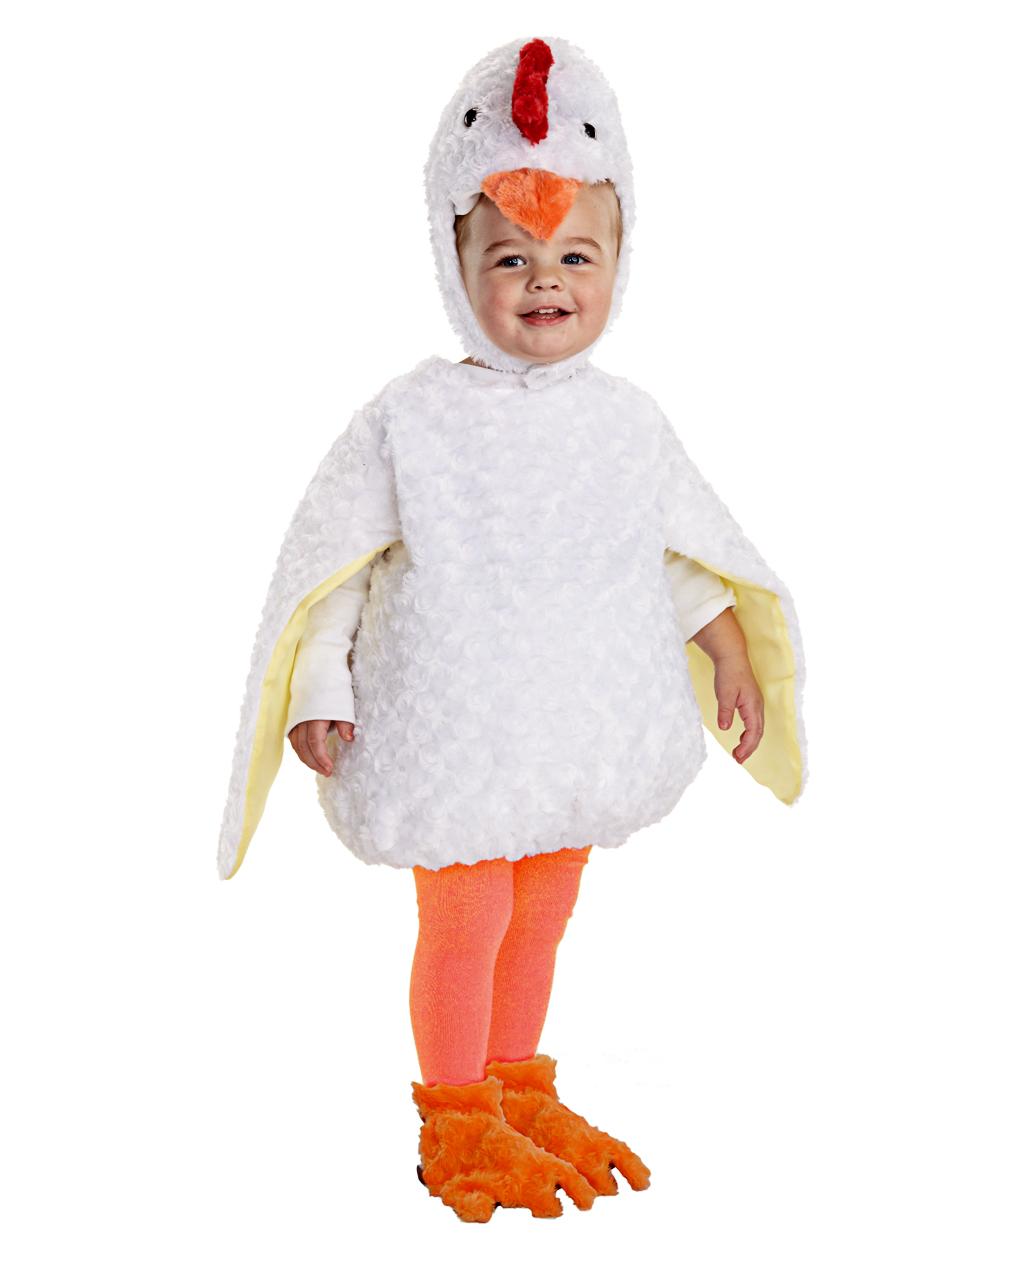 Huhnchen Babykostum Fur Fasching Horror Shop Com